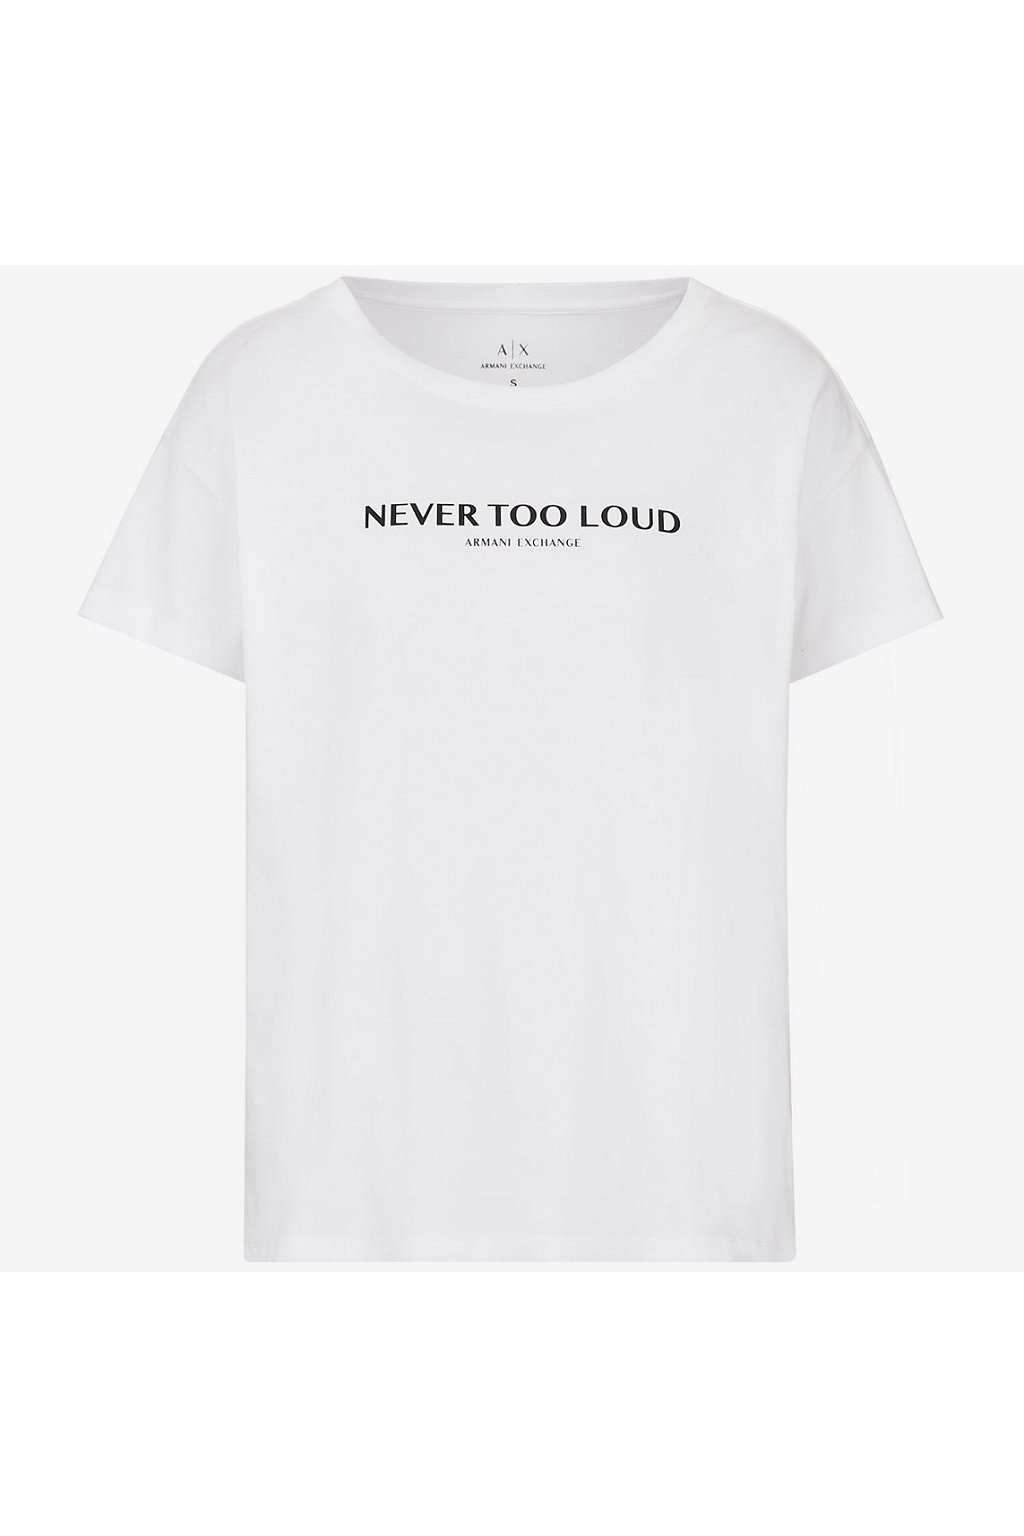 Dámské tričko Armani Exchange 6KYTAH YJ6QZ bílé